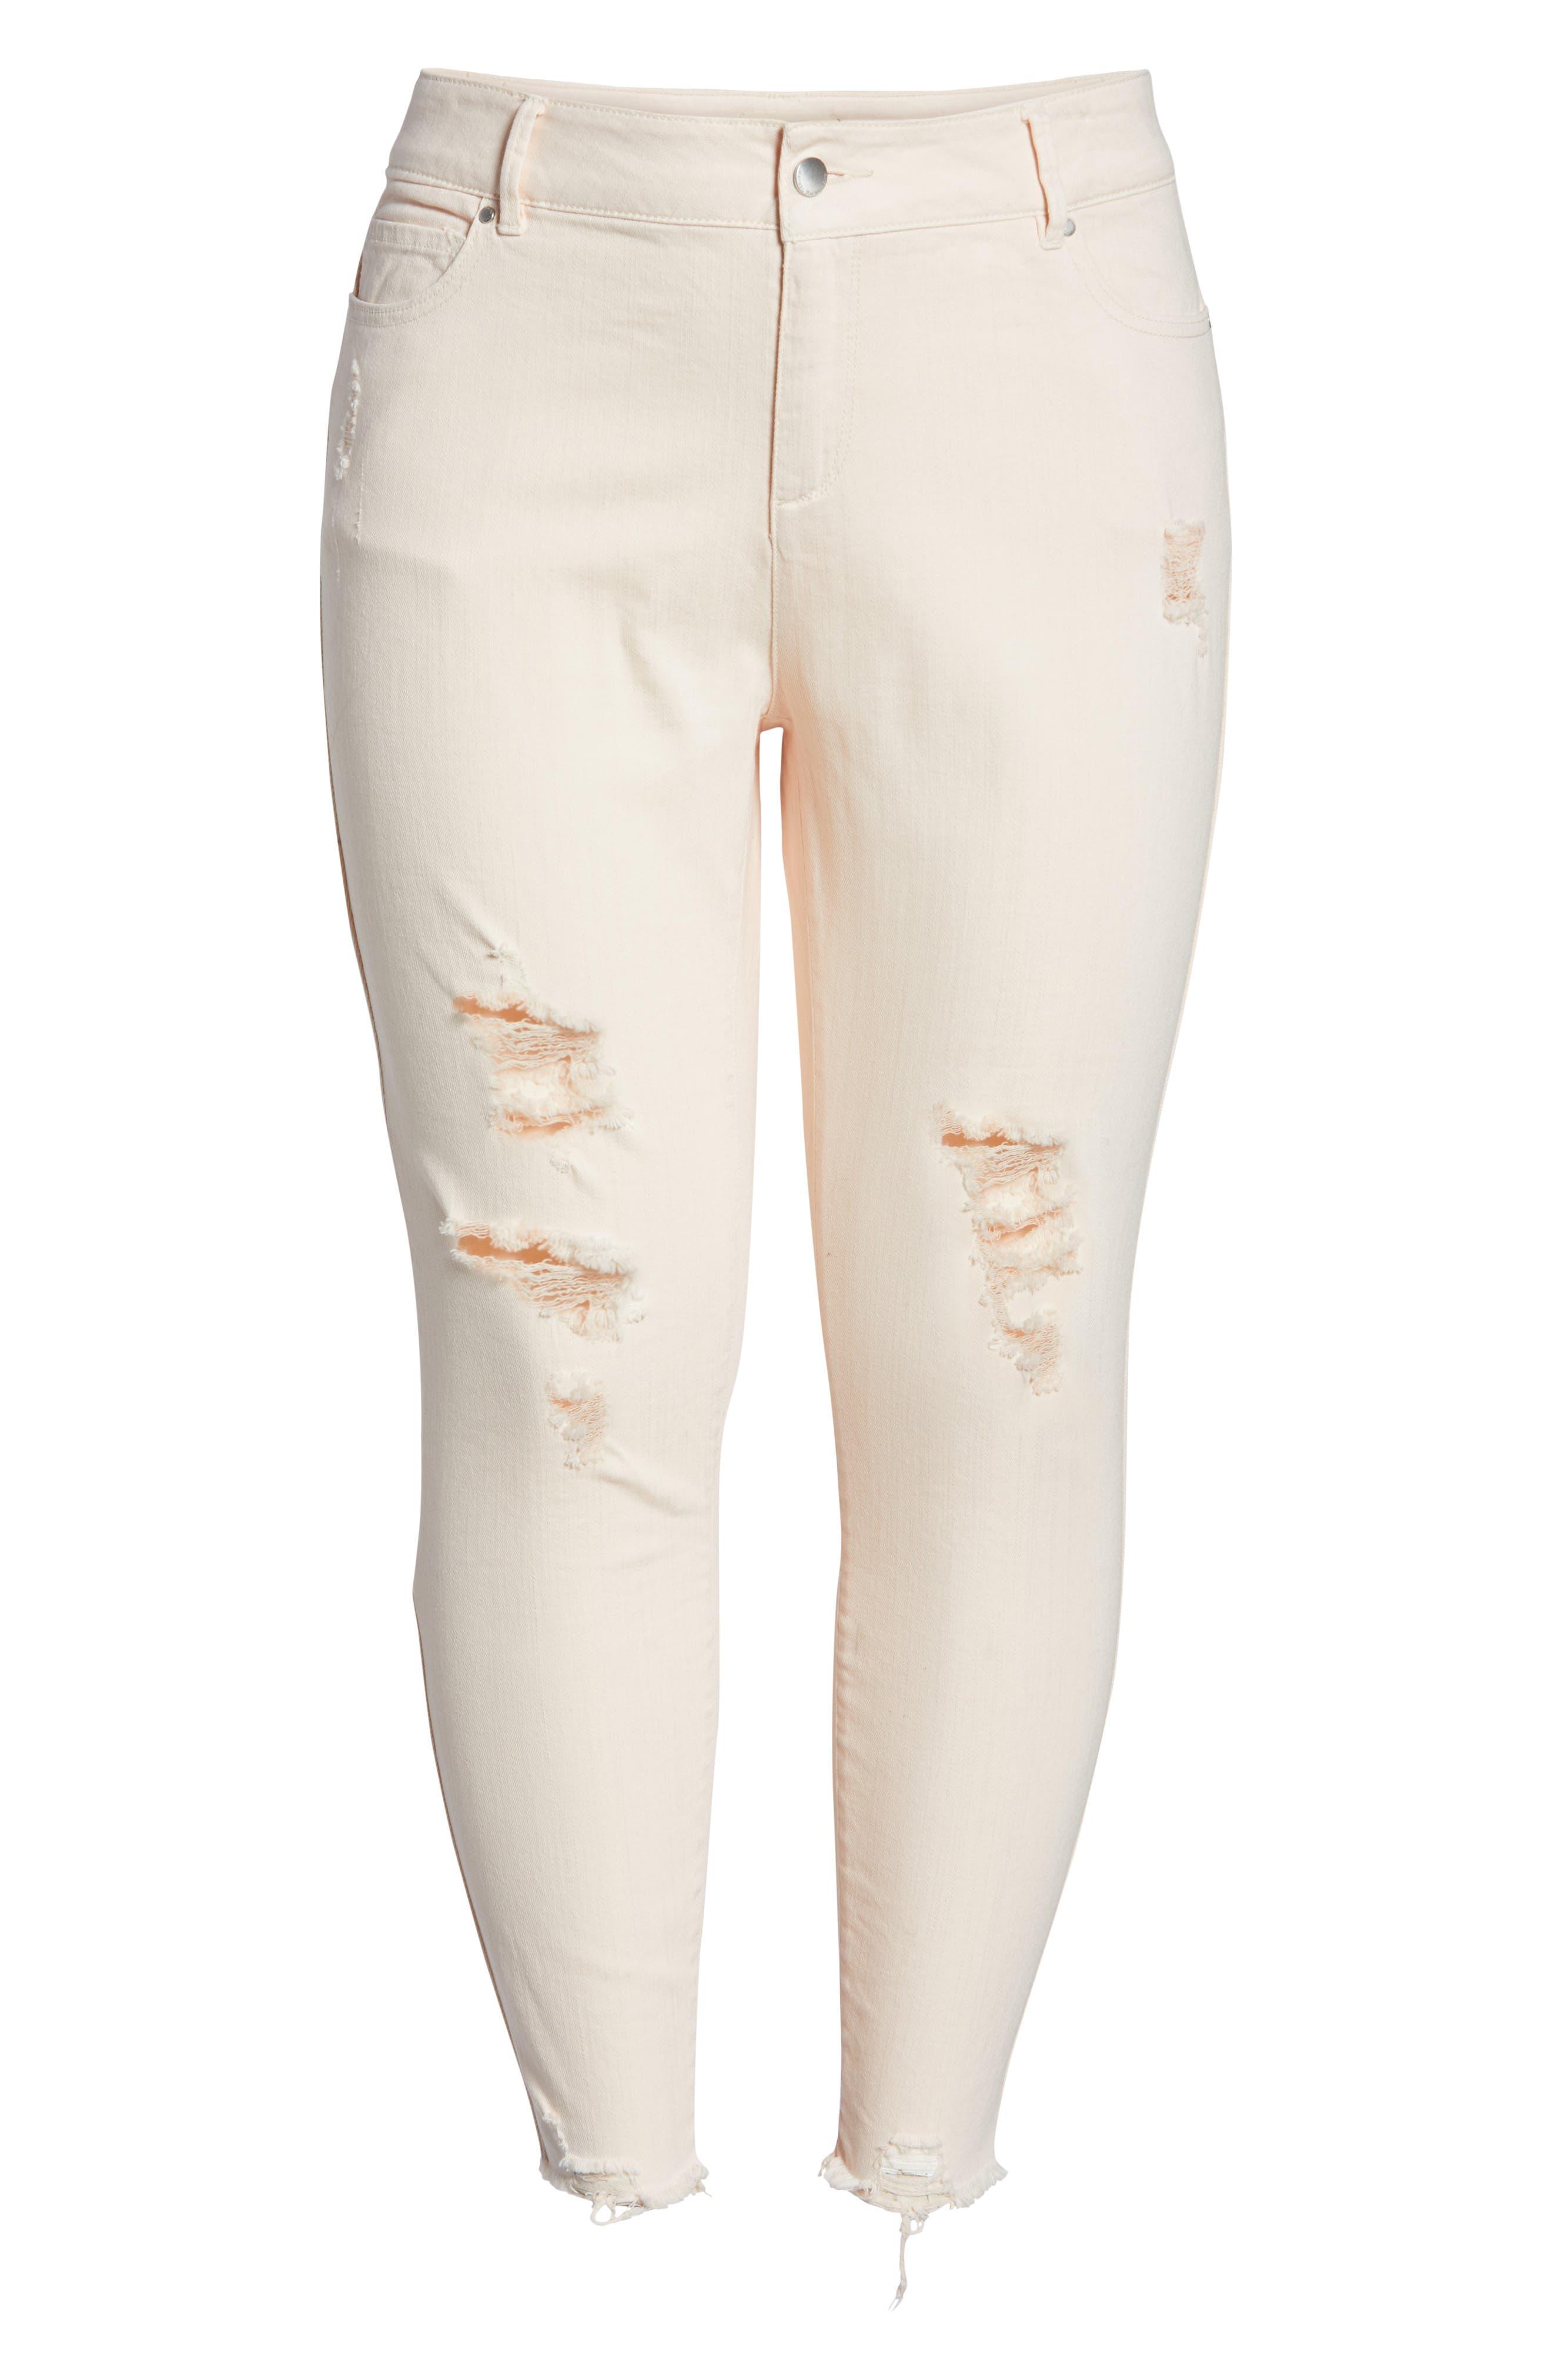 RACHEL RACHEL ROY, Icon Distressed Skinny Jeans, Alternate thumbnail 6, color, 680